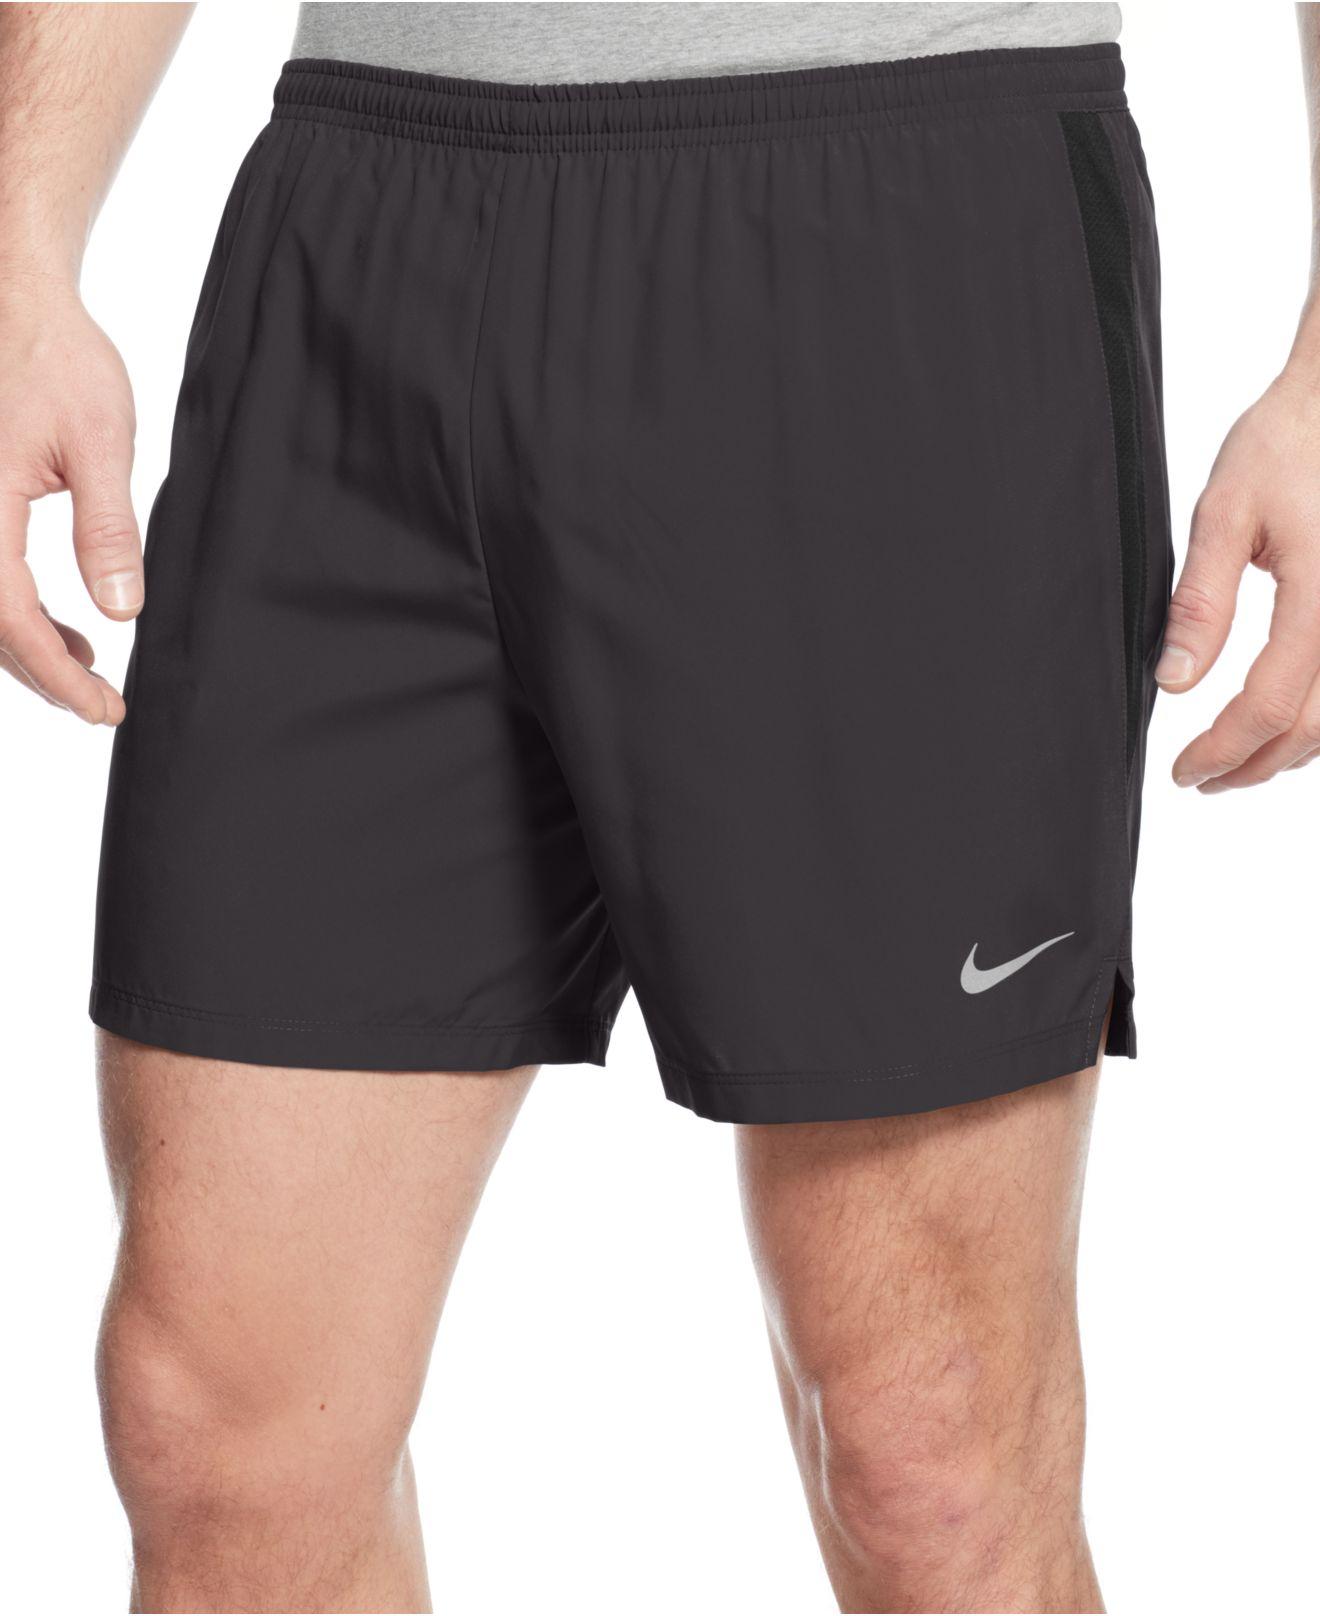 lyst nike 5 challenger dri fit shorts in gray for men. Black Bedroom Furniture Sets. Home Design Ideas